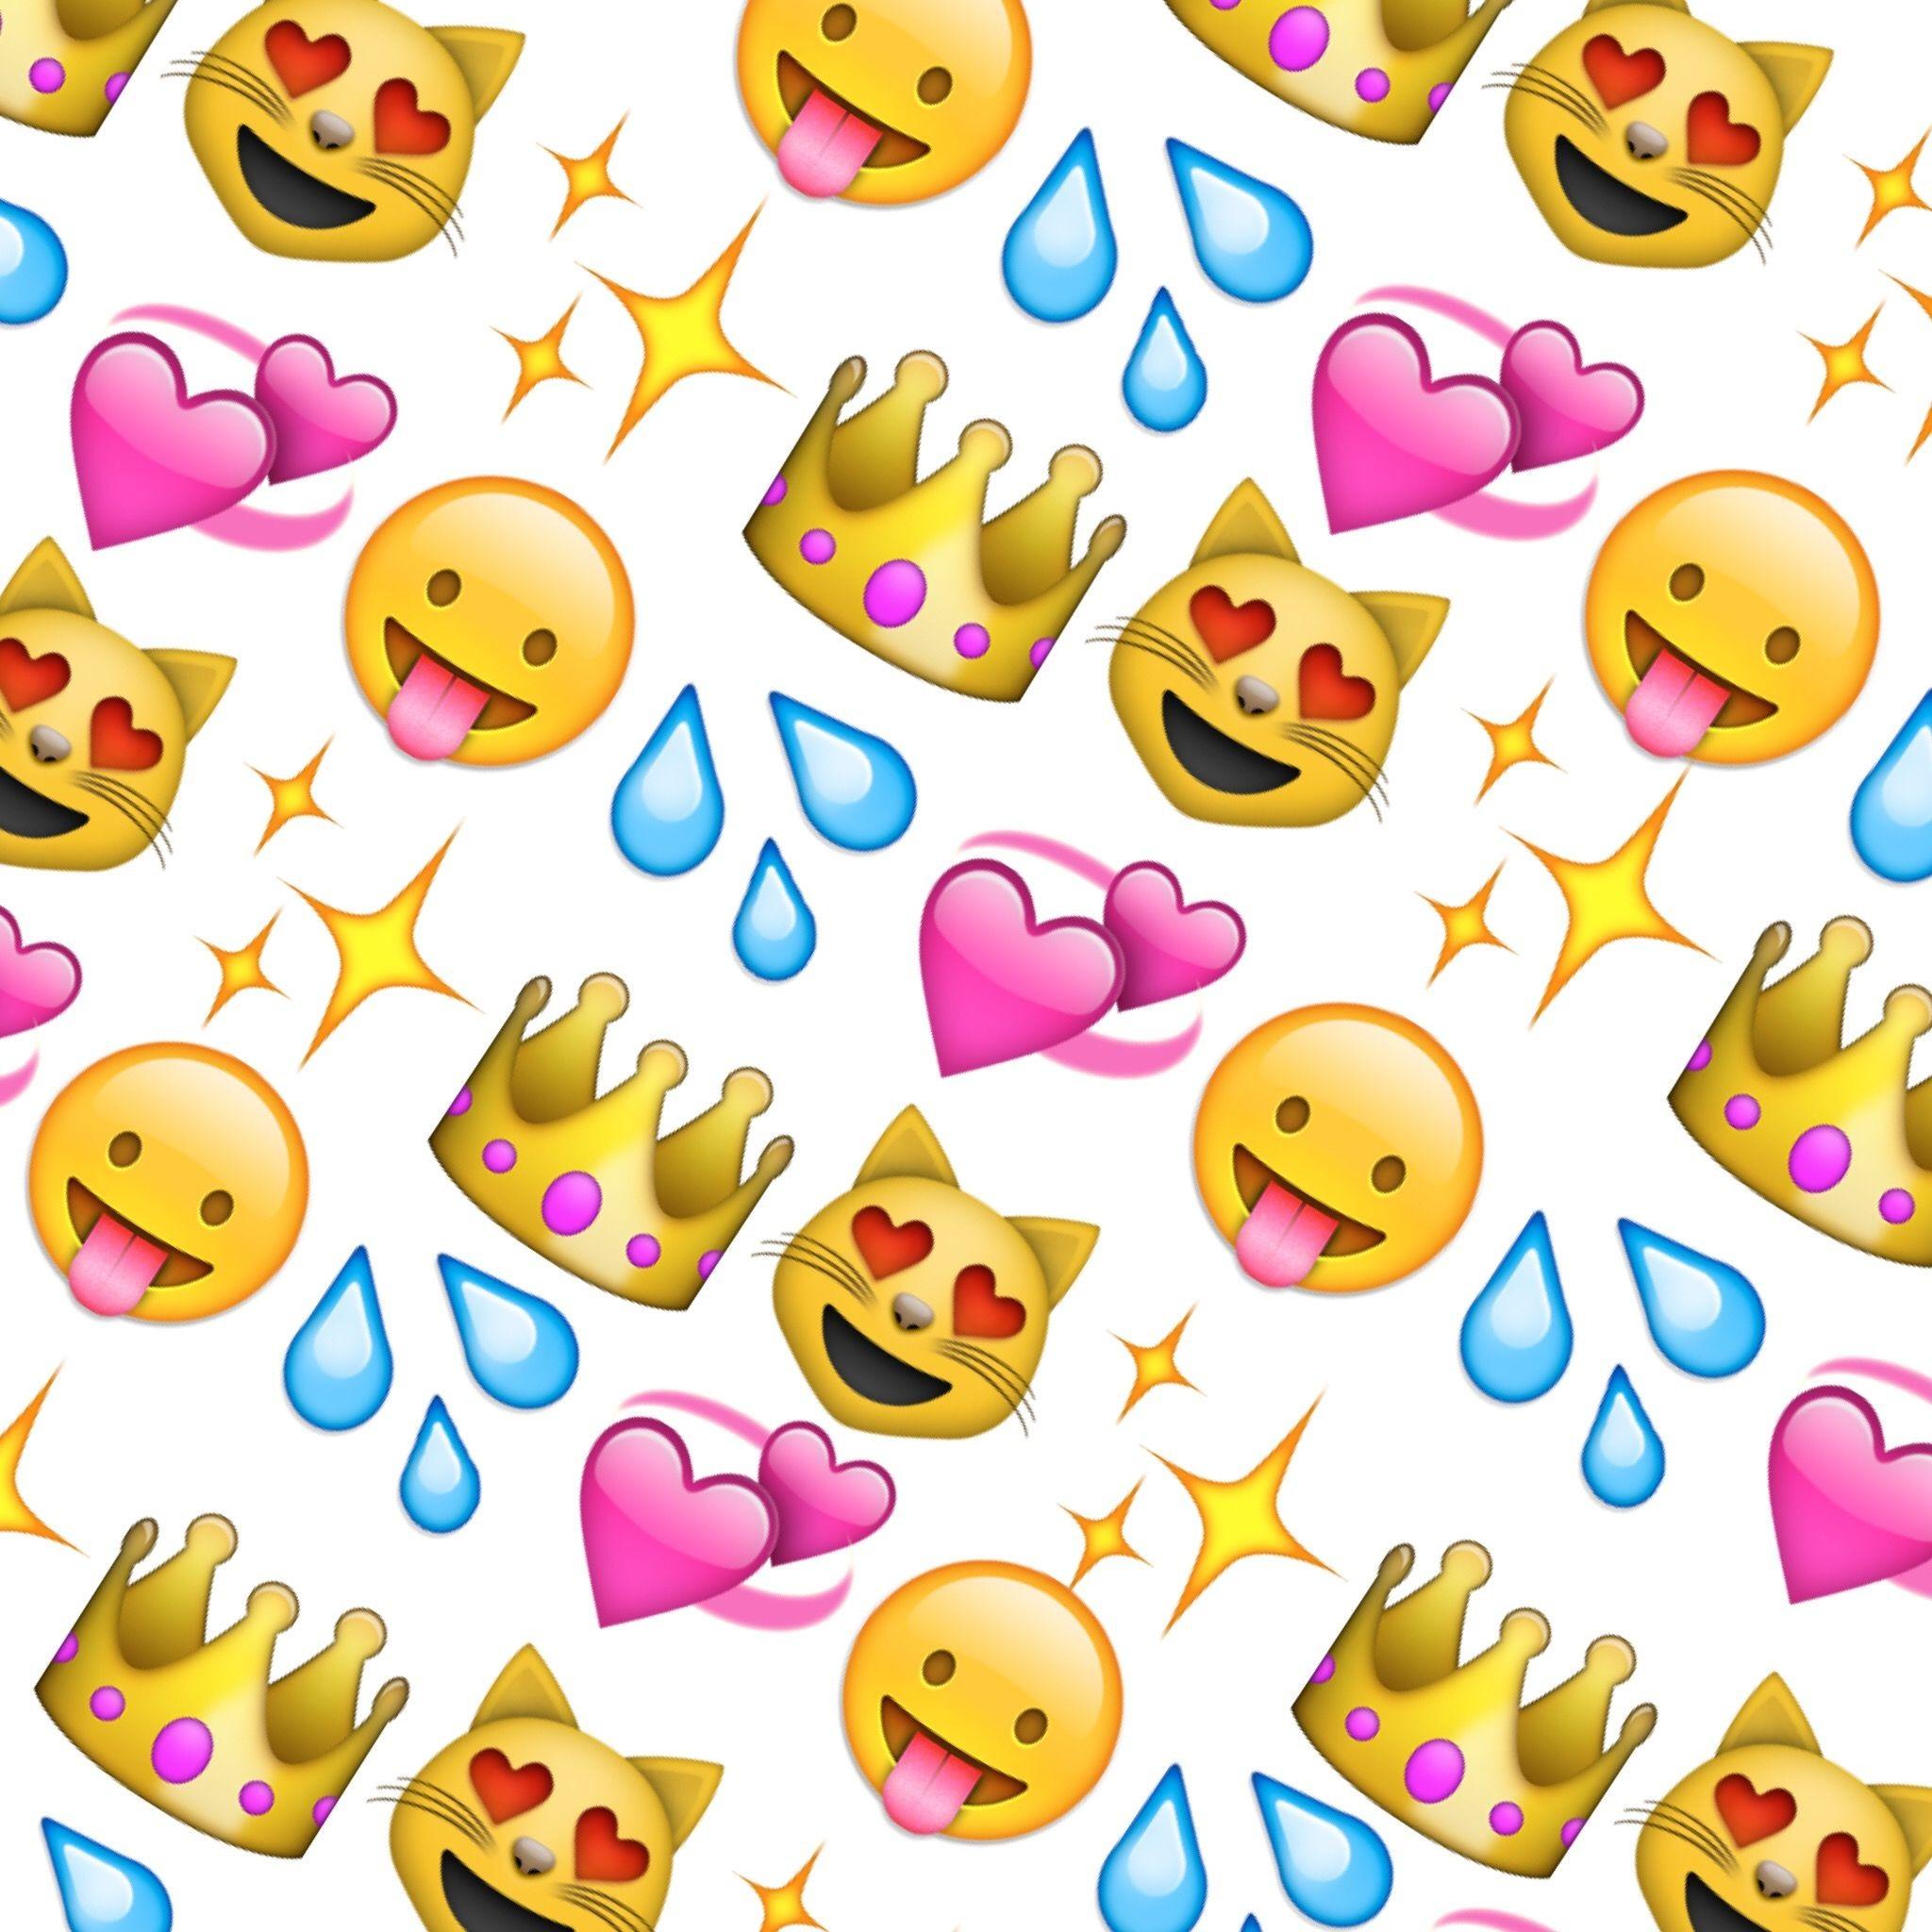 Emoji Wallpaper 1 Download Free Amazing High Resolution